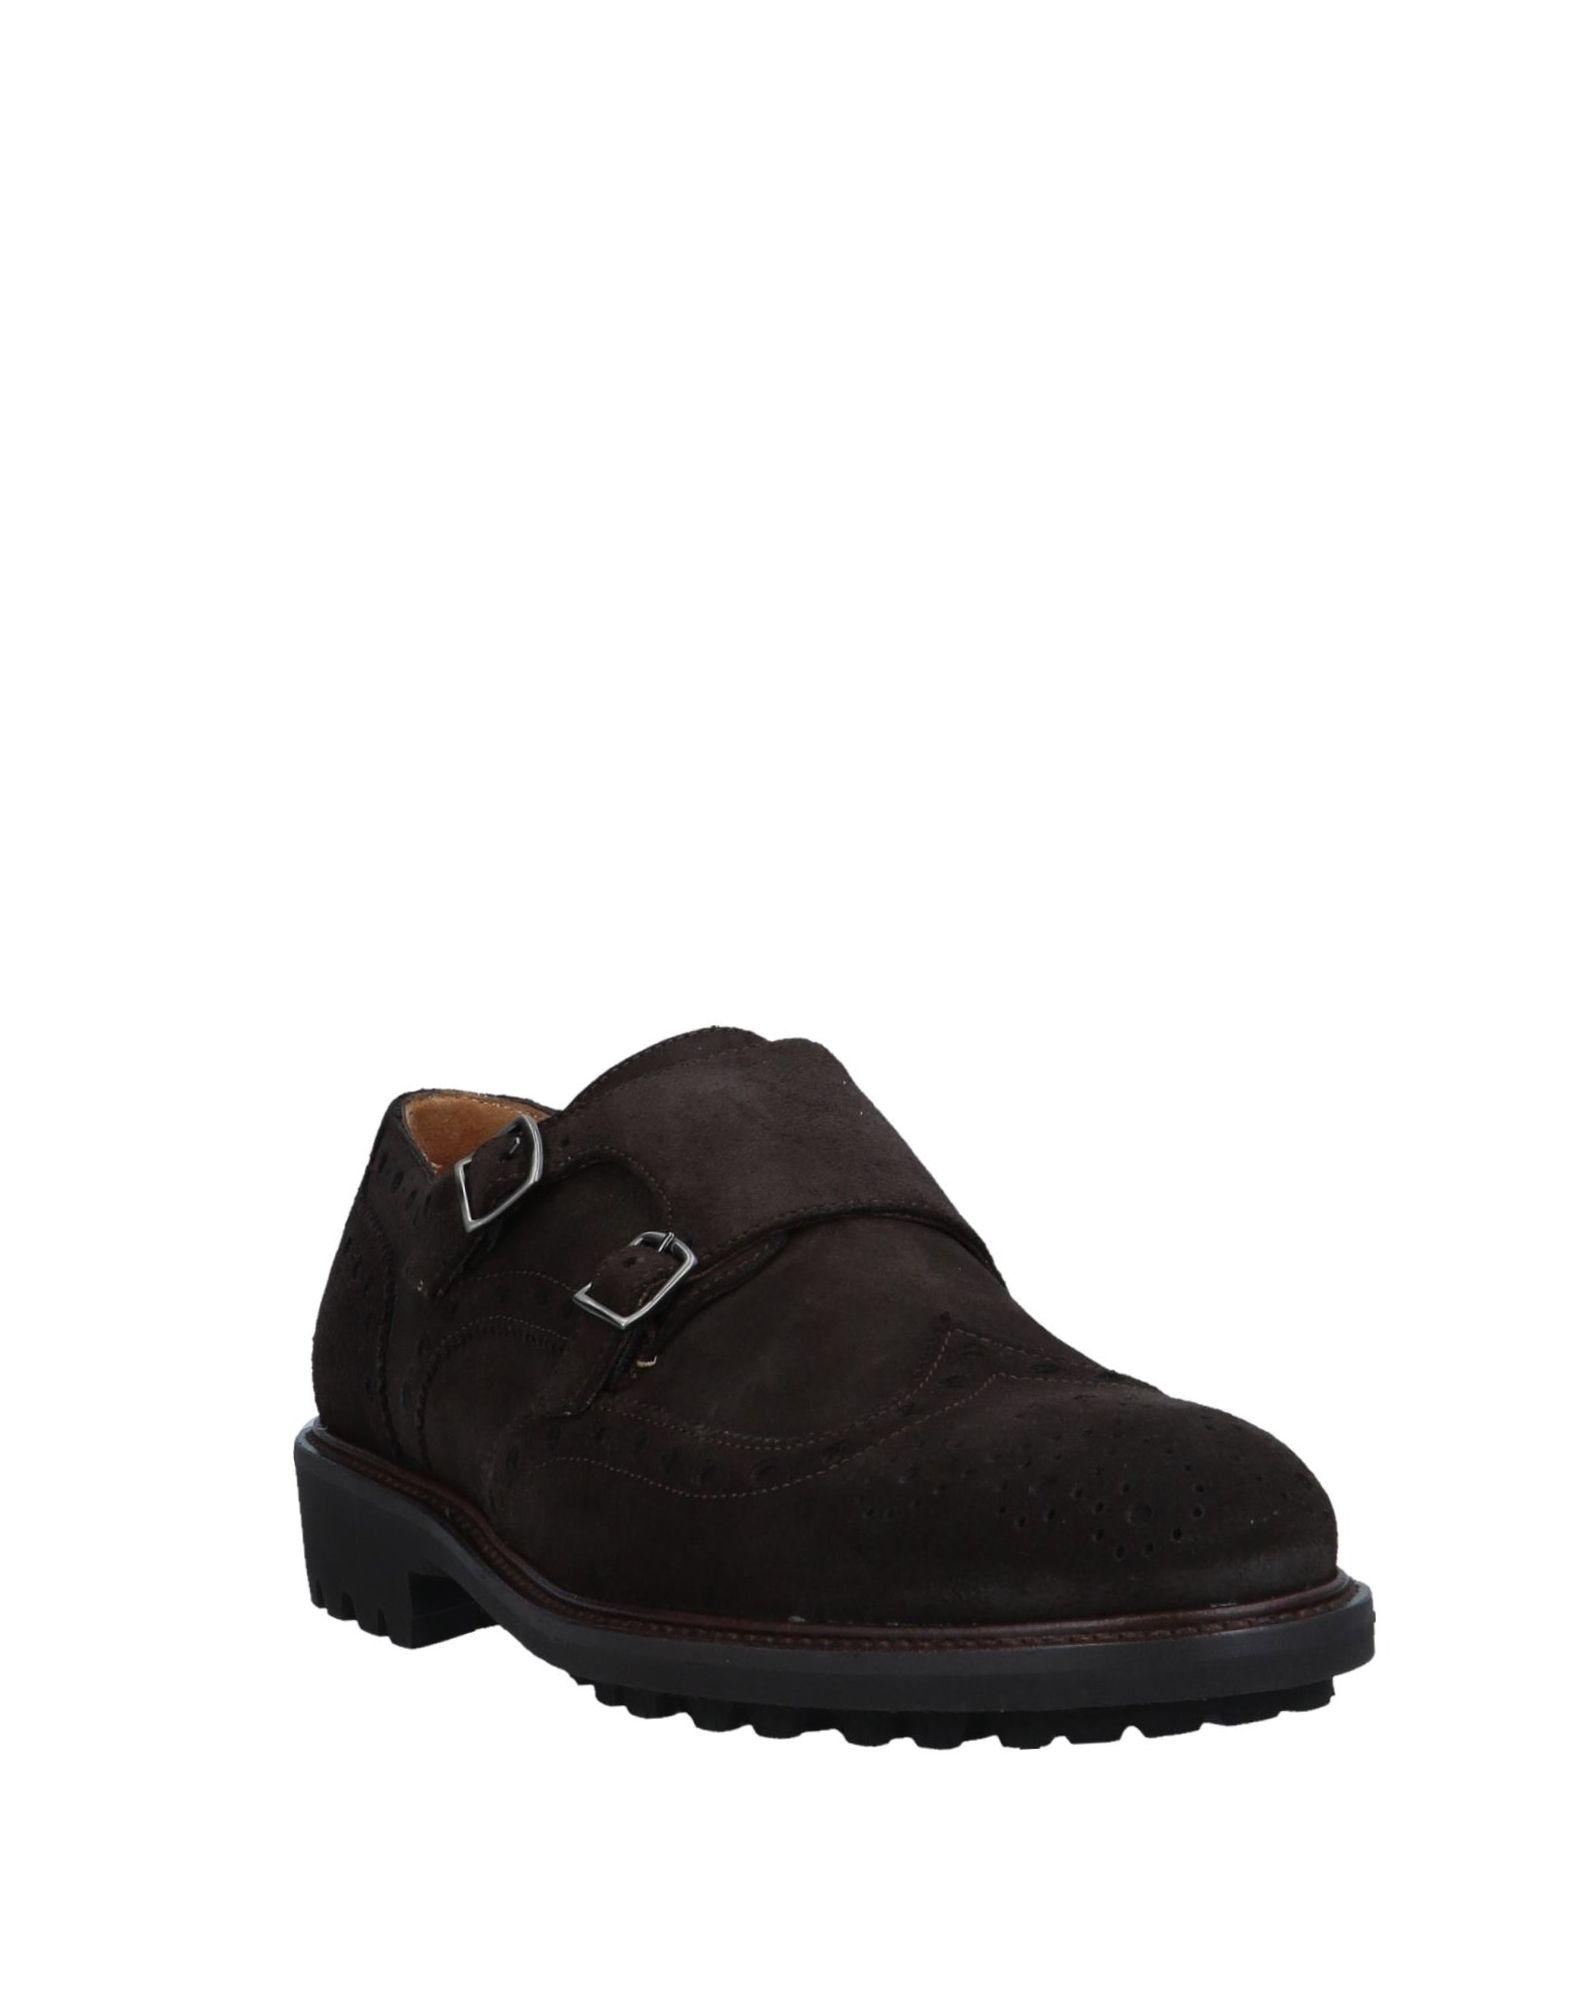 Rabatt echte Schuhe Triver 11556973JQ Flight Mokassins Herren  11556973JQ Triver 2f1080